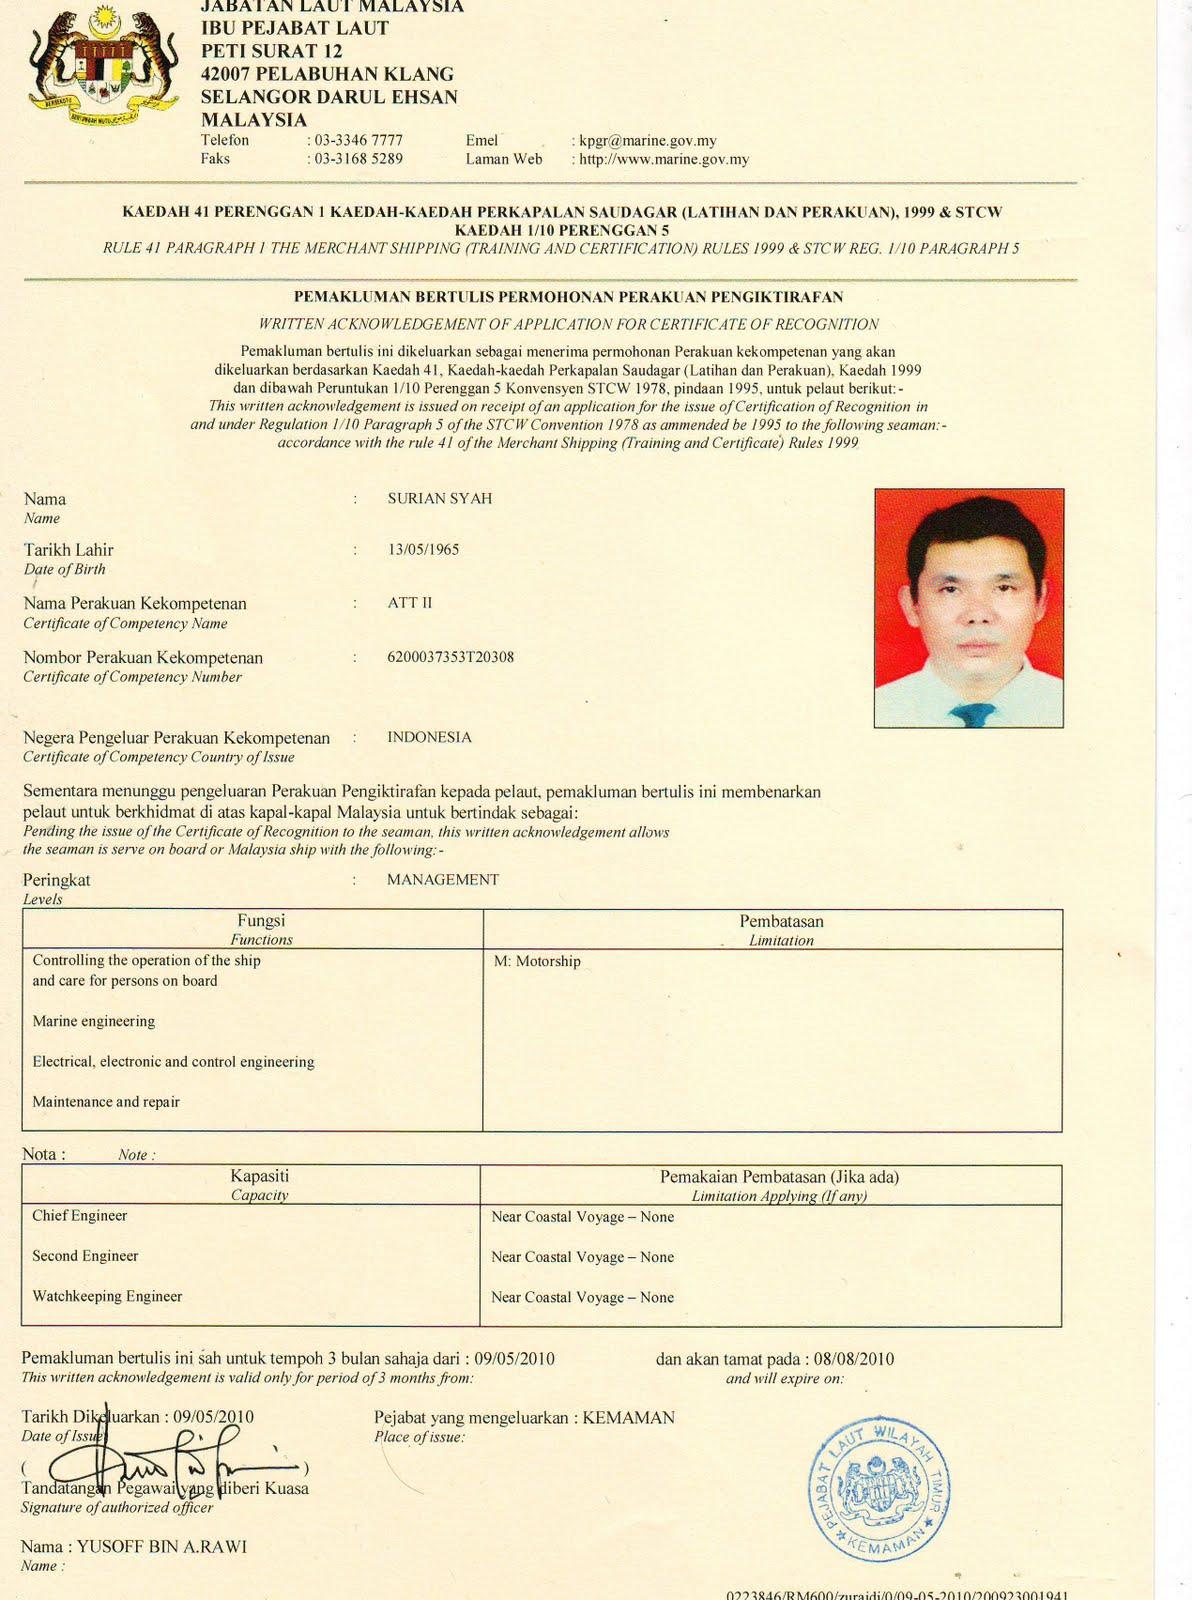 Cv surian syah malaysia written acknowledgement of application malaysia written acknowledgement of application for certificate of recognition xflitez Images